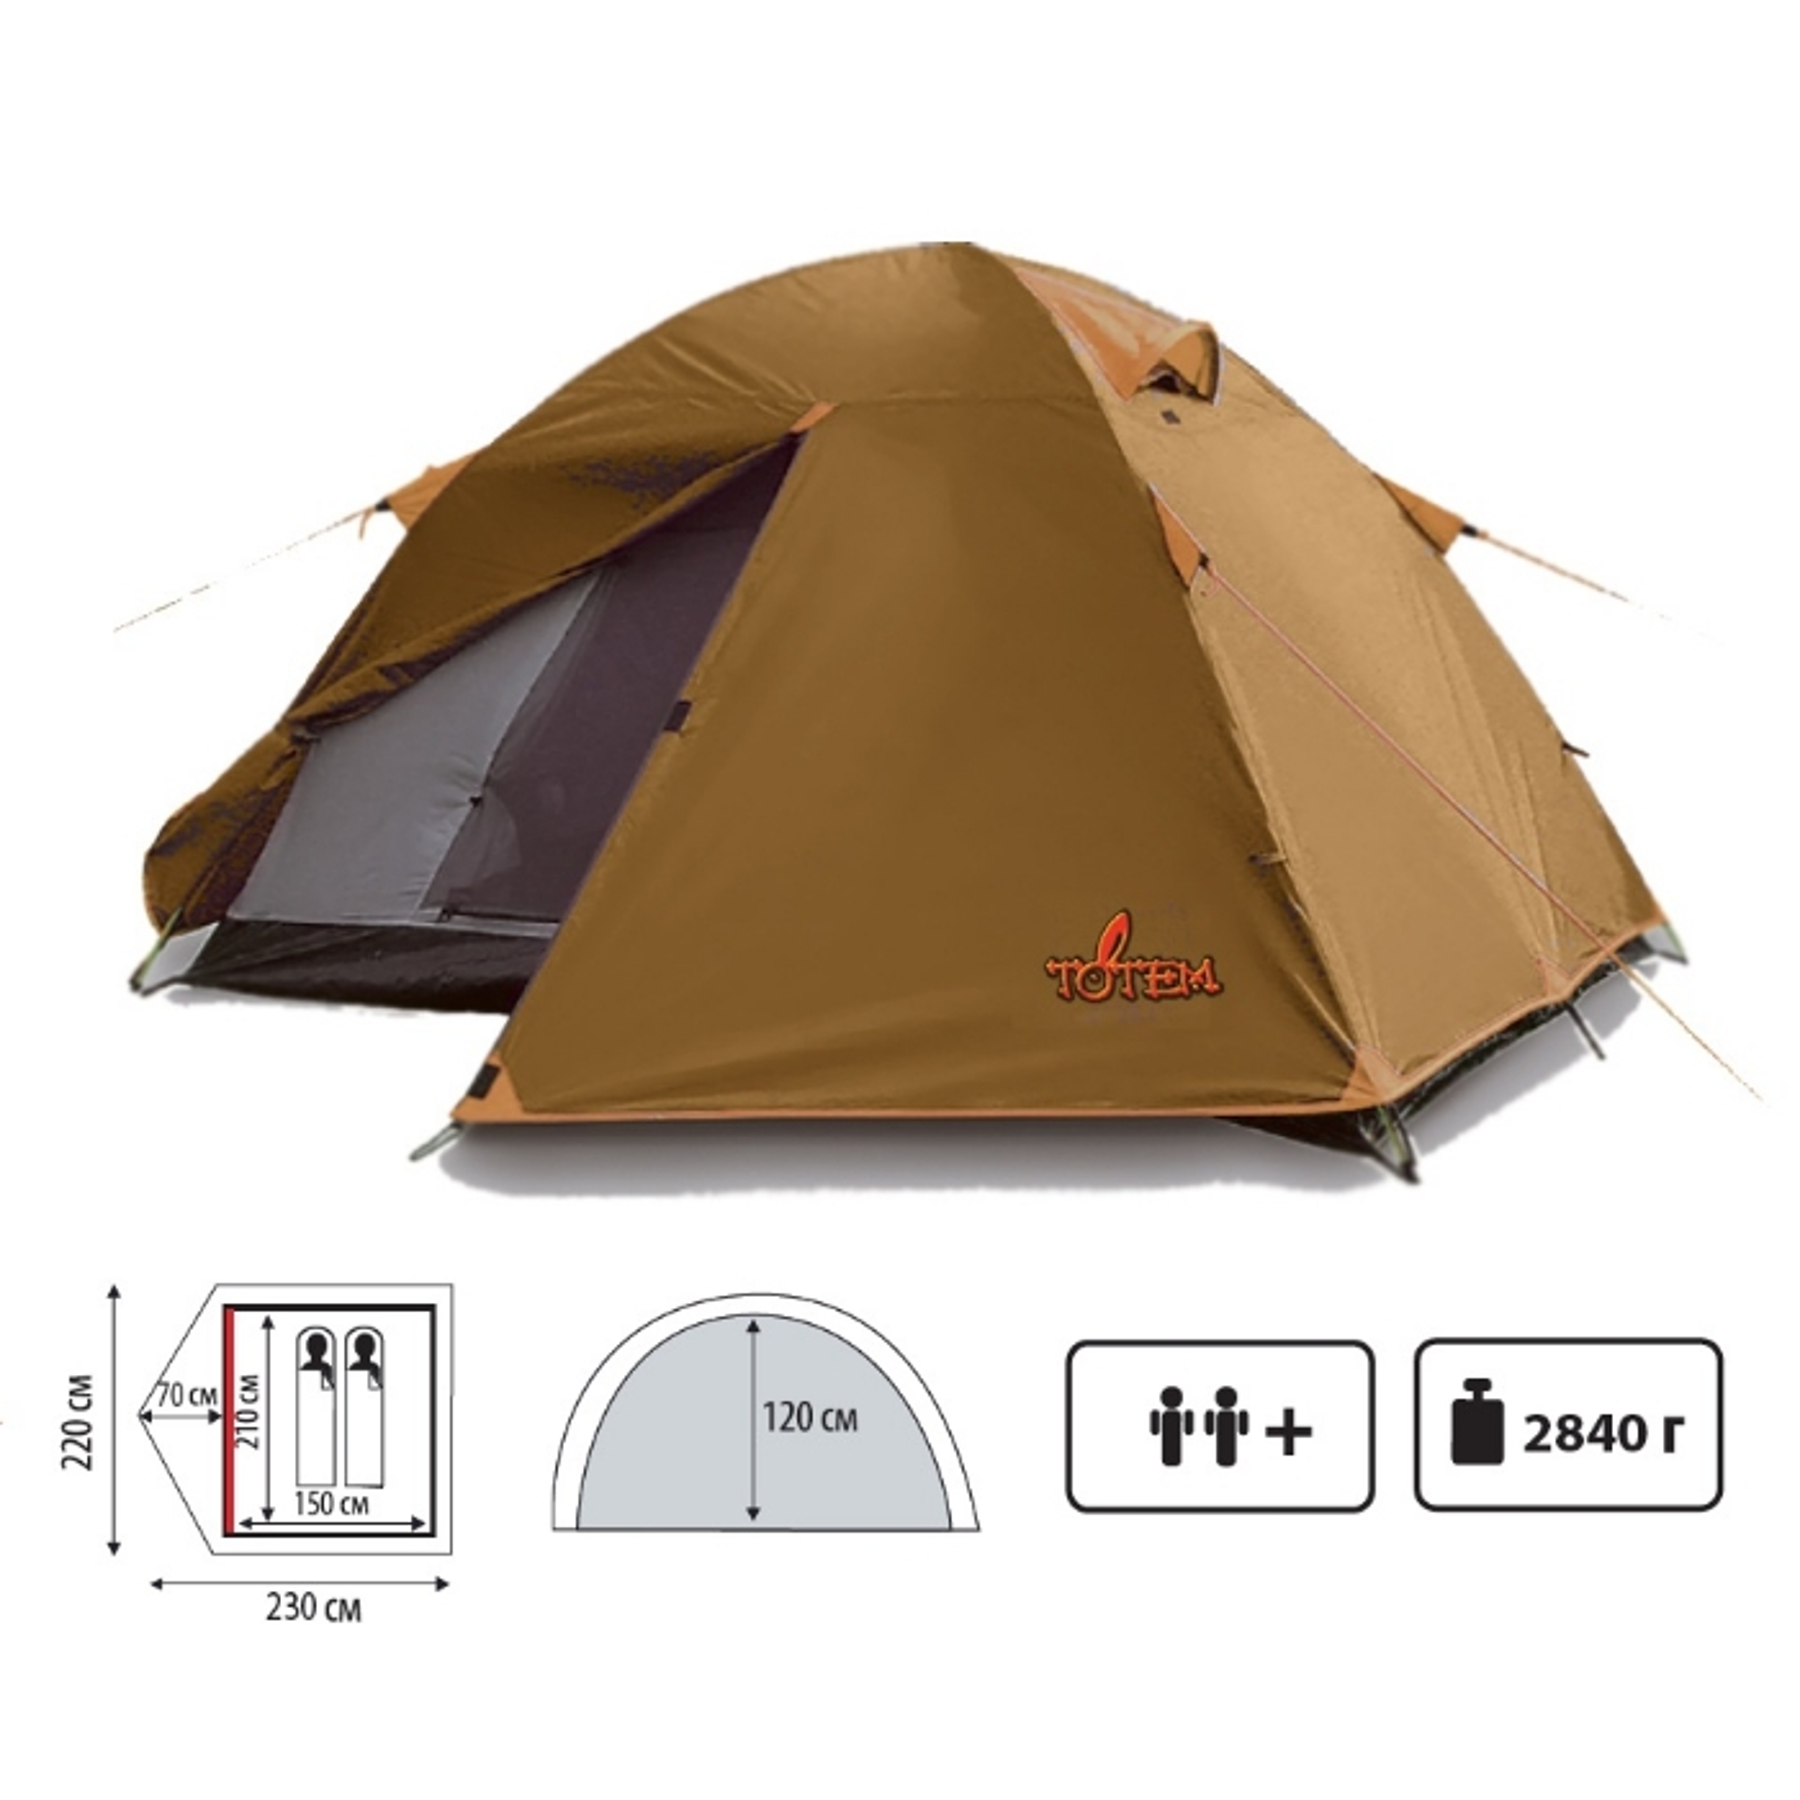 Палатка Totem TEPEE 2 арт.TTT-003.09 (двухсл, водост.1500мм, 230*220*120см, тамбур 70 см)